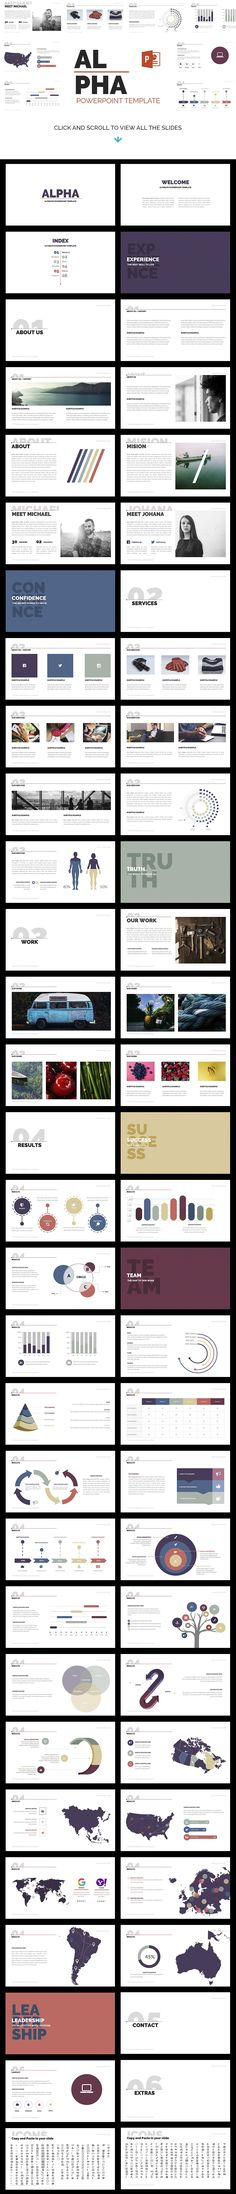 Top Notch Powerpoint Bundle by Zacomic Studios on @creativemarket